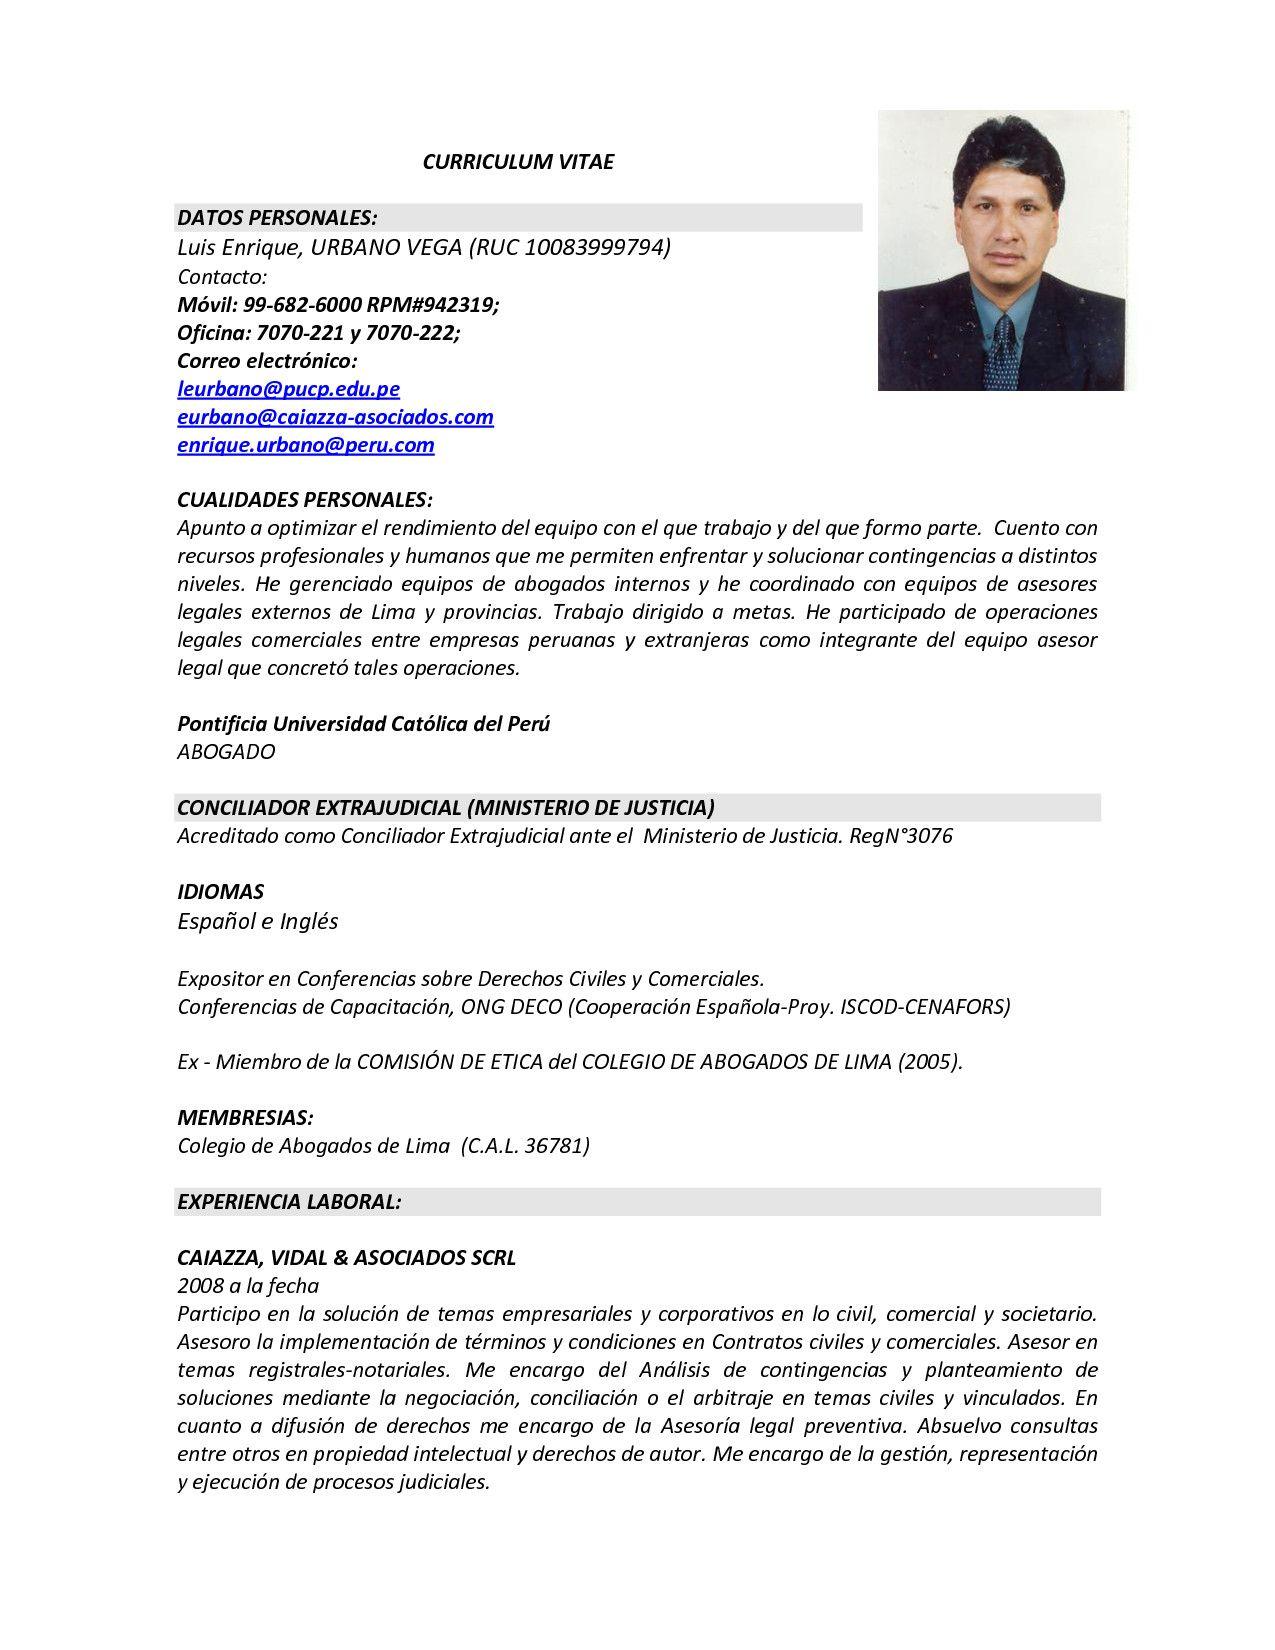 36+ Resume en espanol 2020 ideas in 2021